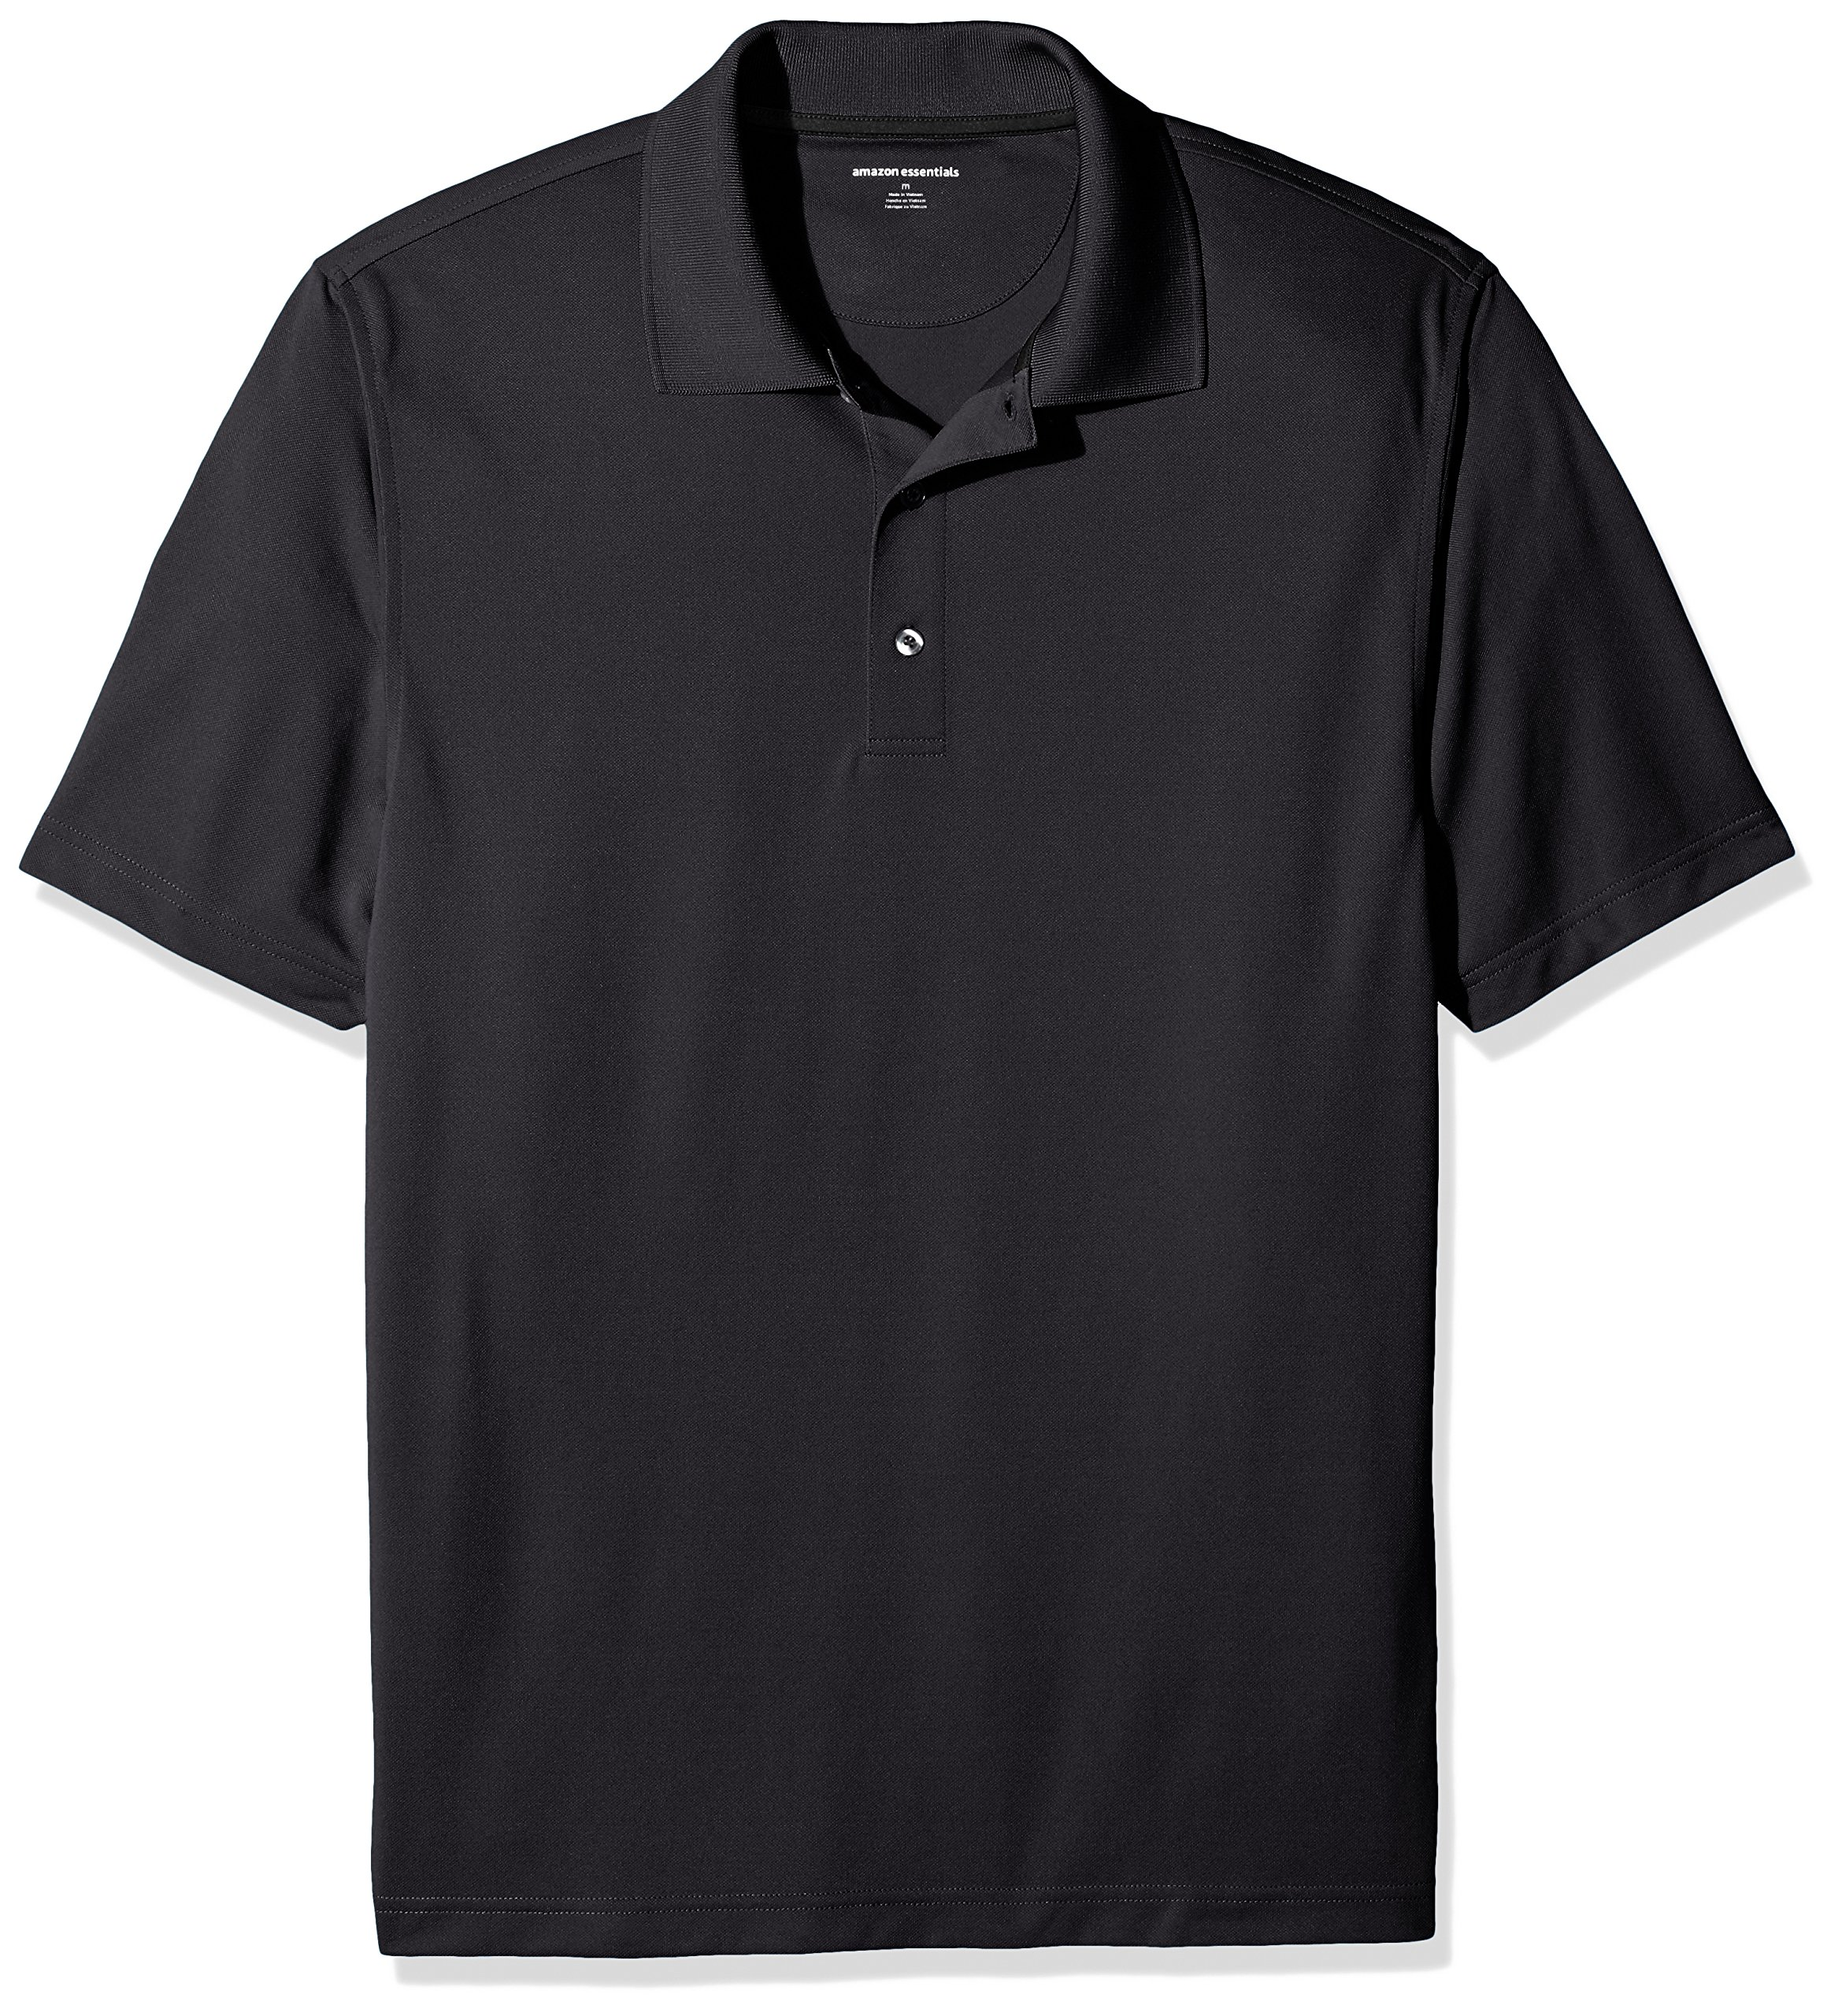 Amazon Essentials Men's Regular-Fit Quick-Dry Golf Polo Shirt, Black, X-Large